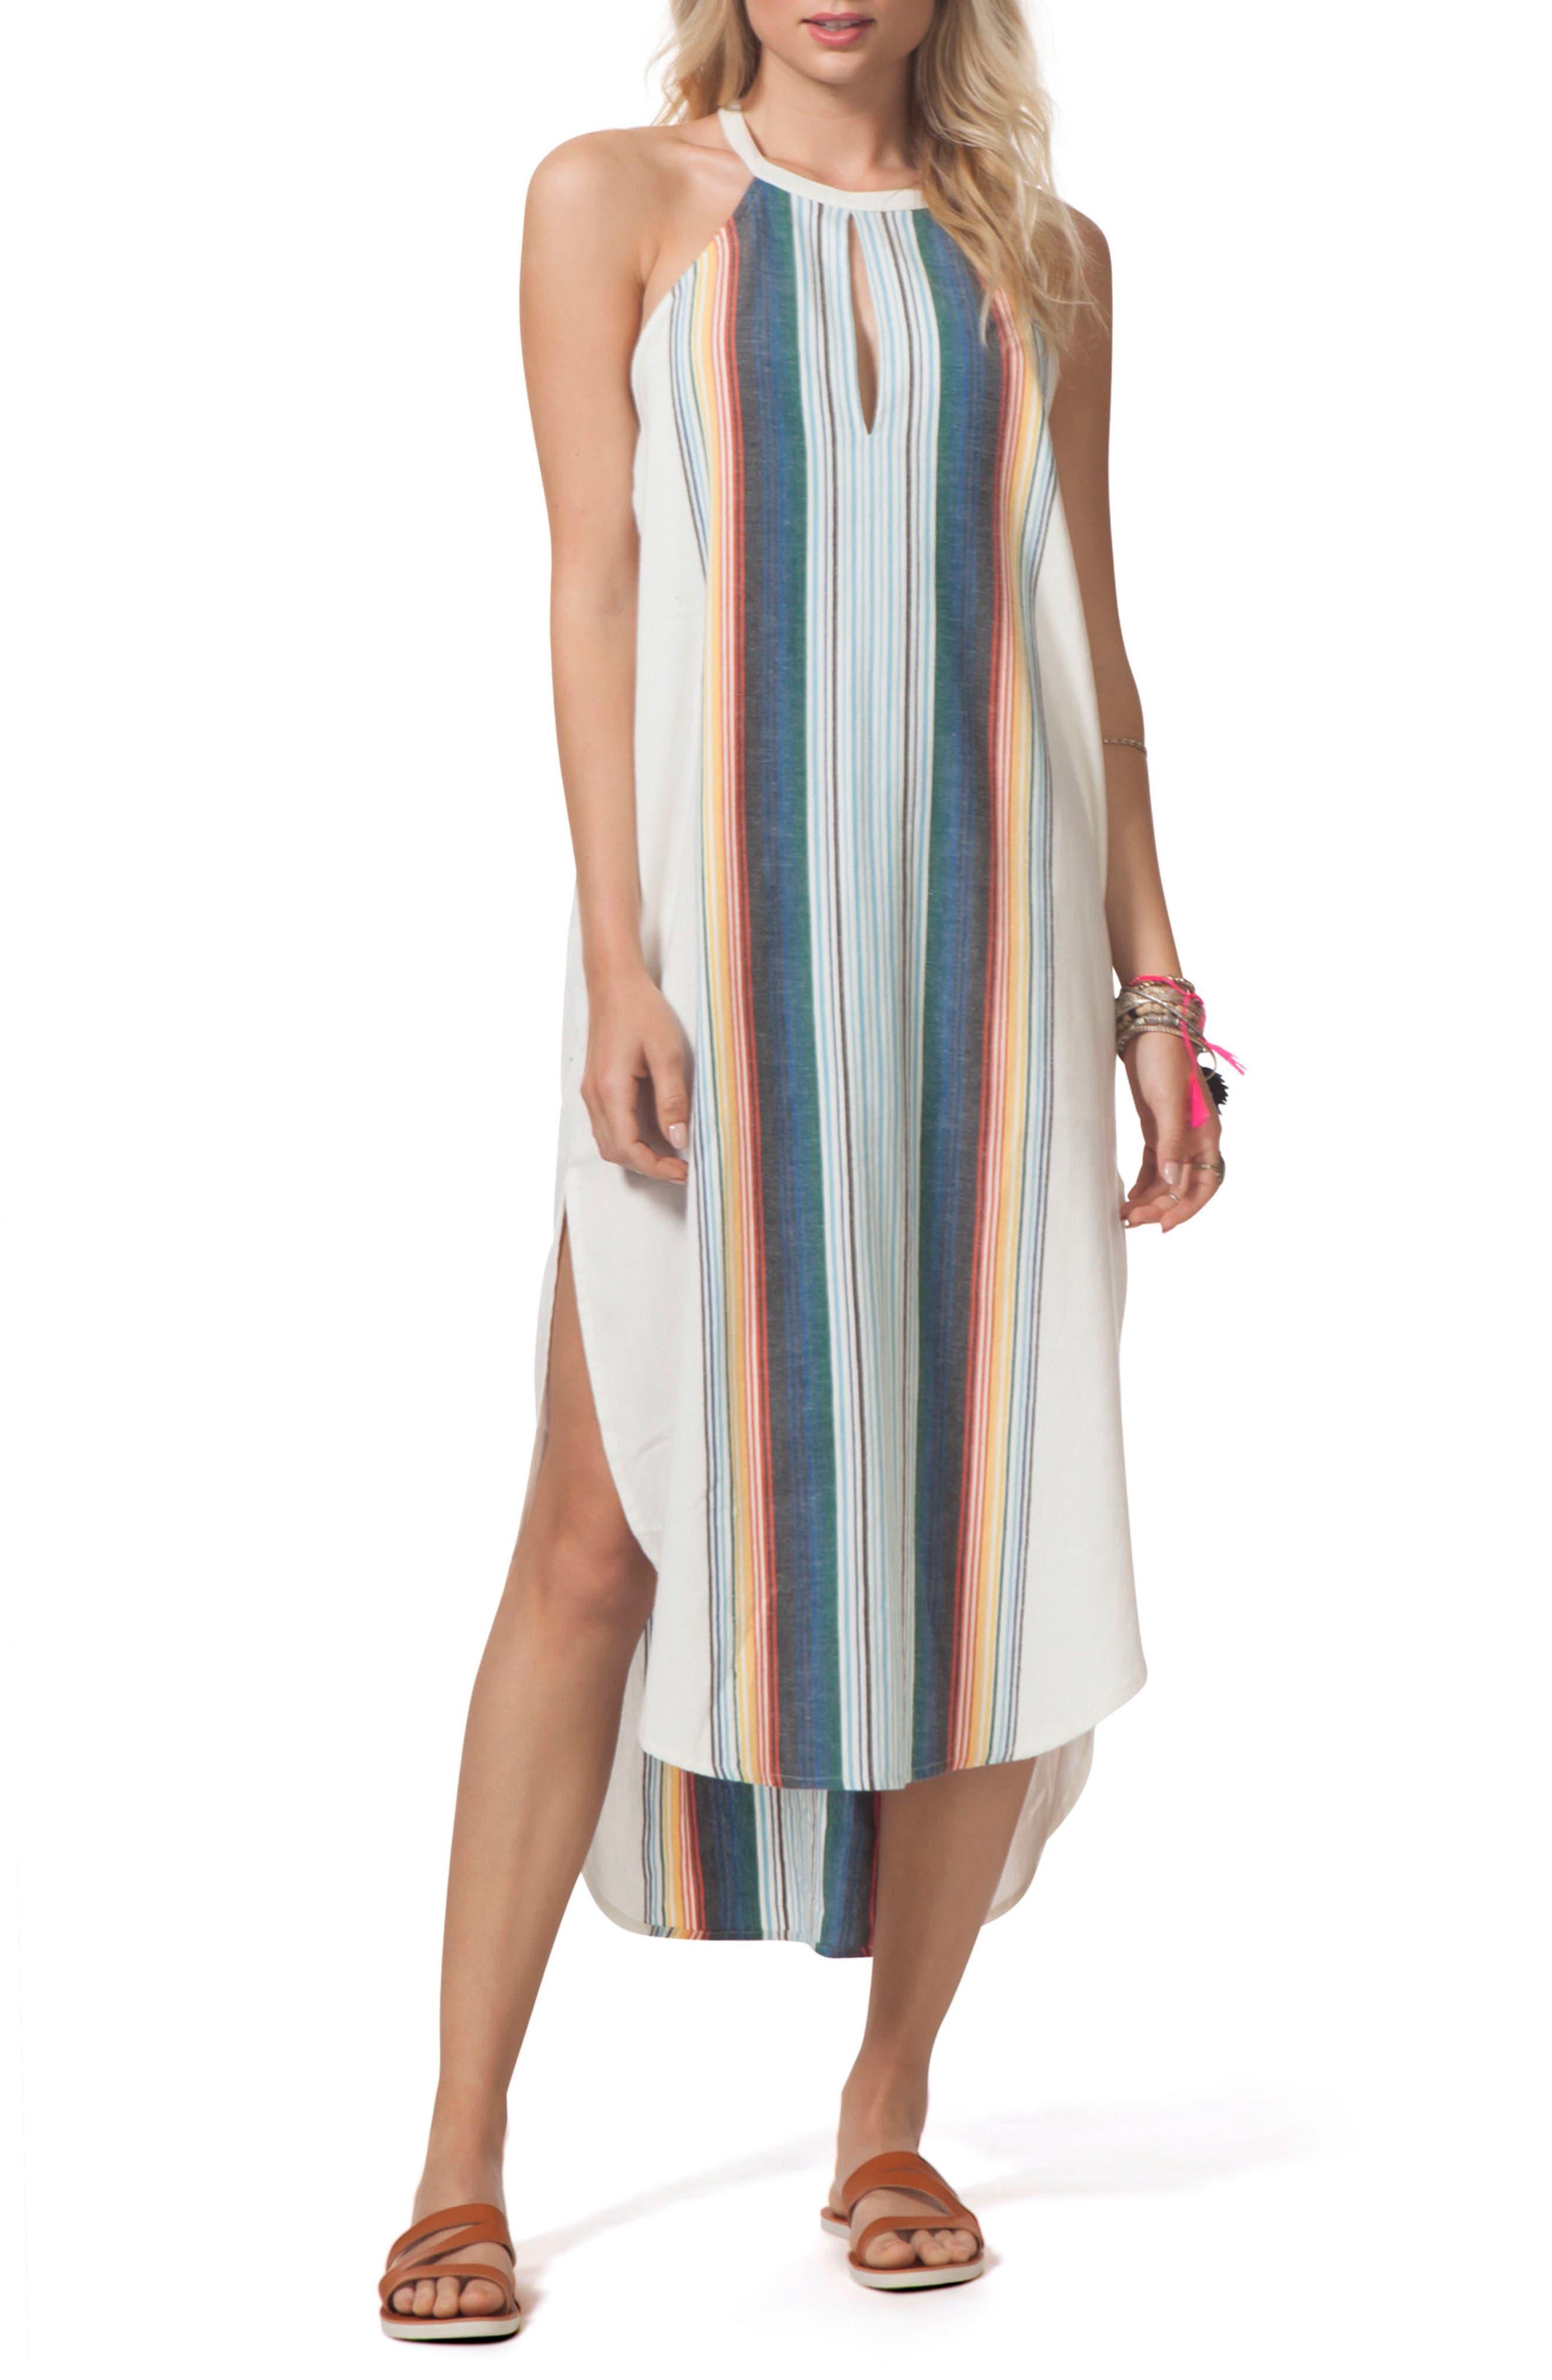 Beach Bazaar Maxi Dress,                             Main thumbnail 1, color,                             111